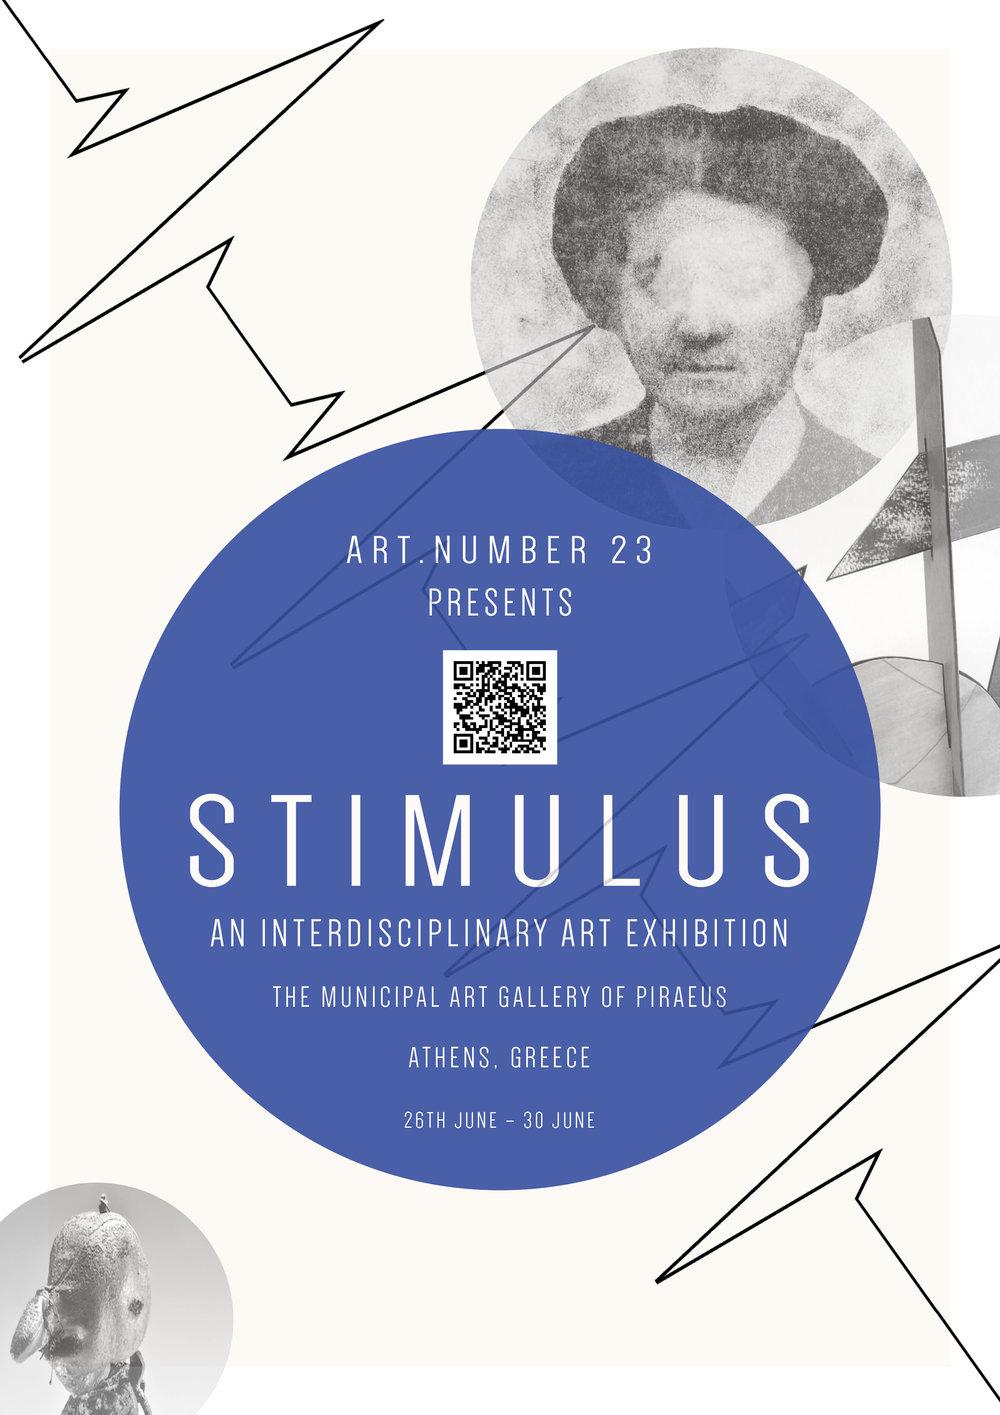 Stimulus Exhibition – Athens, Greece, Municipal Art Gallery of Piraeus Final Poster.jpg